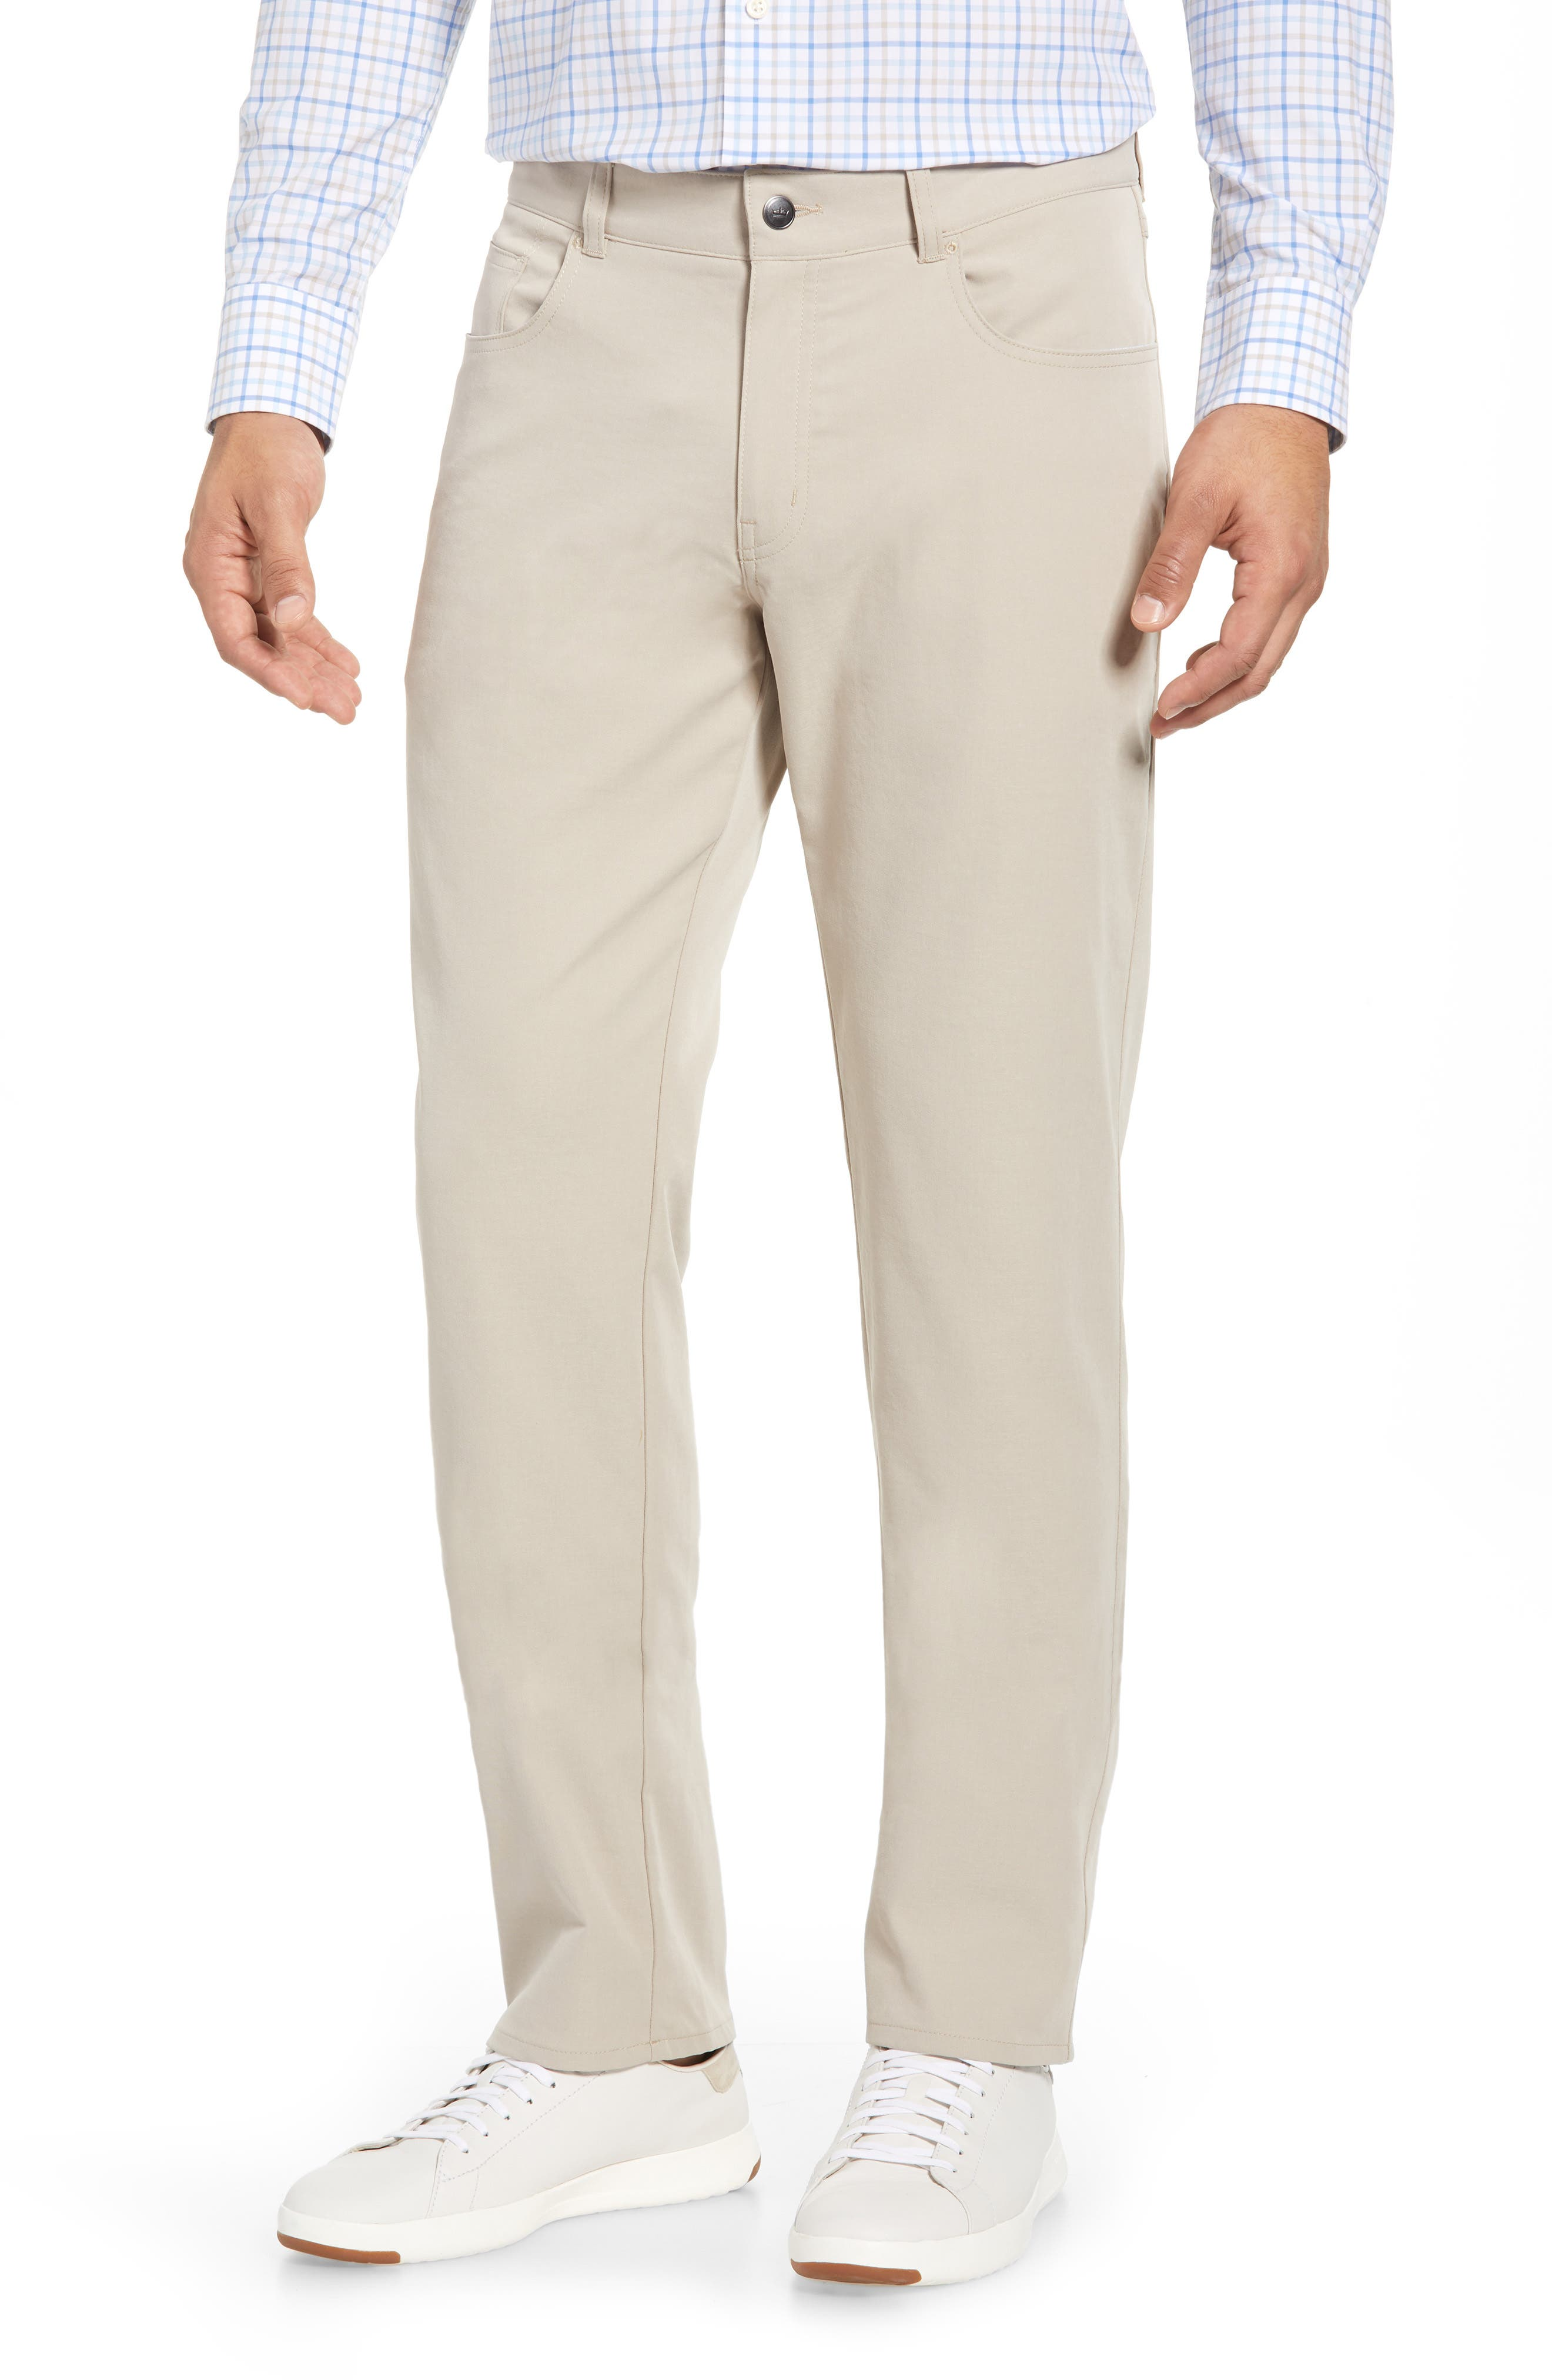 eb66 Regular Fit Performance Pants,                             Main thumbnail 1, color,                             BEIGE